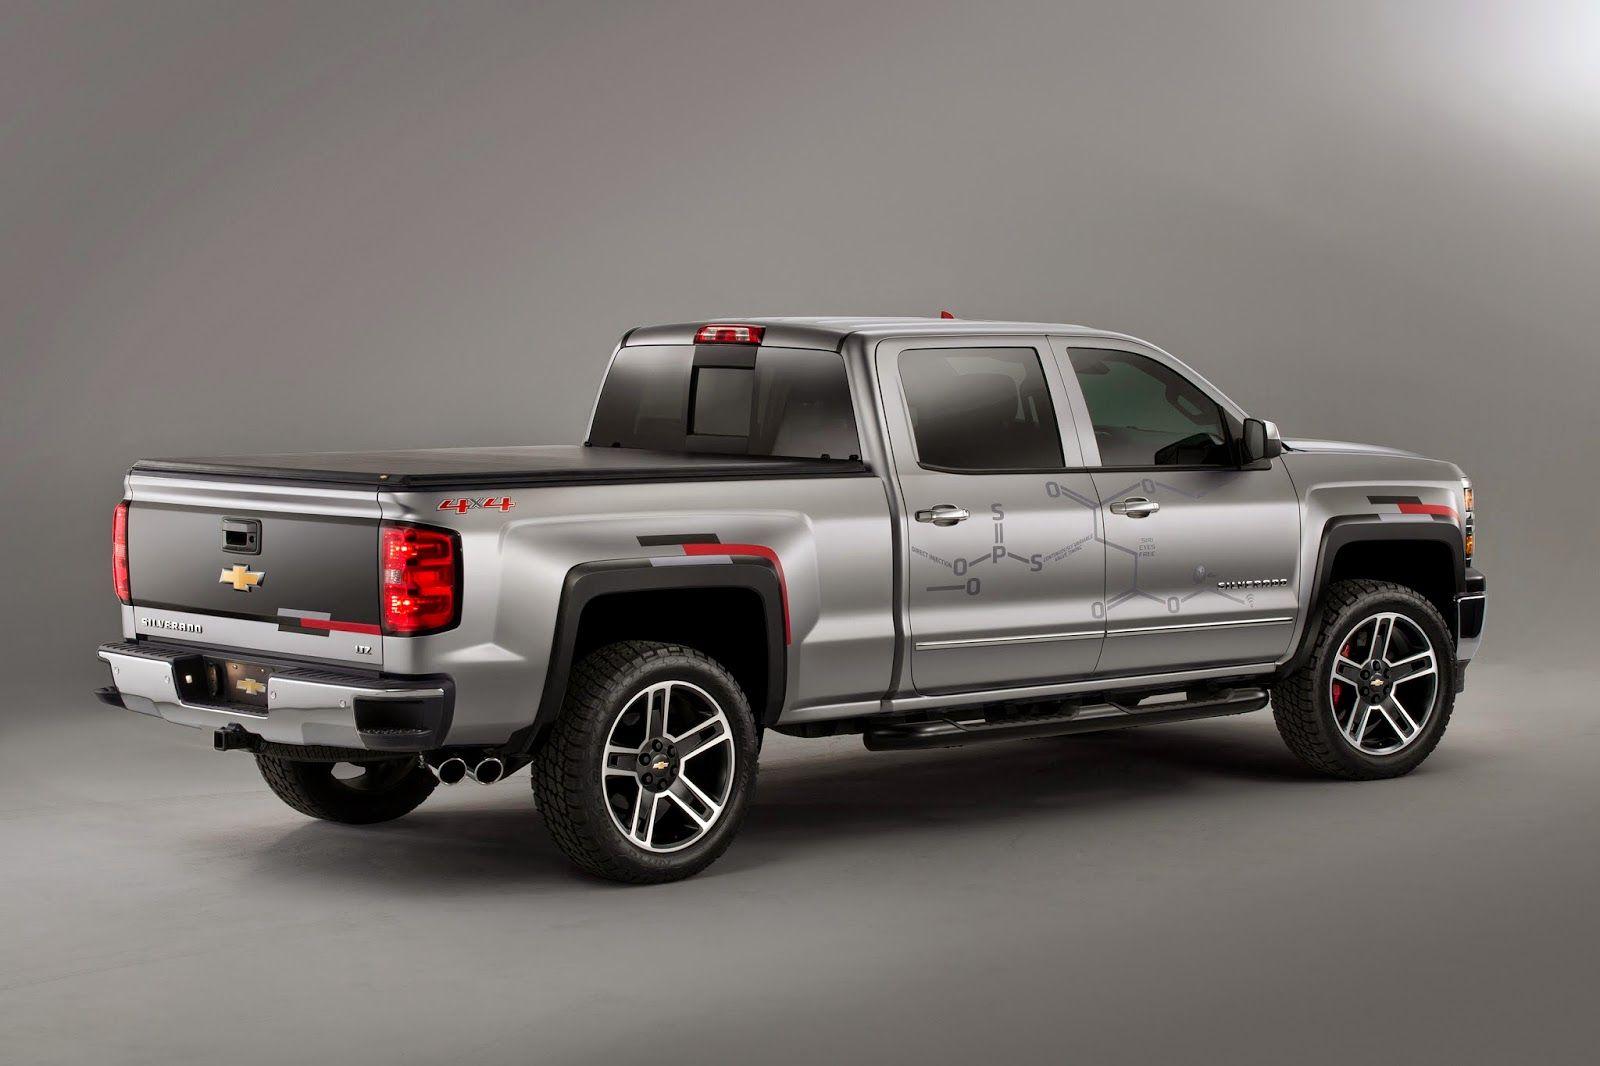 Truck chevy concept truck reaper : 2015 Chevrolet Silverado Toughnology Concept Truck Debut   Richard ...